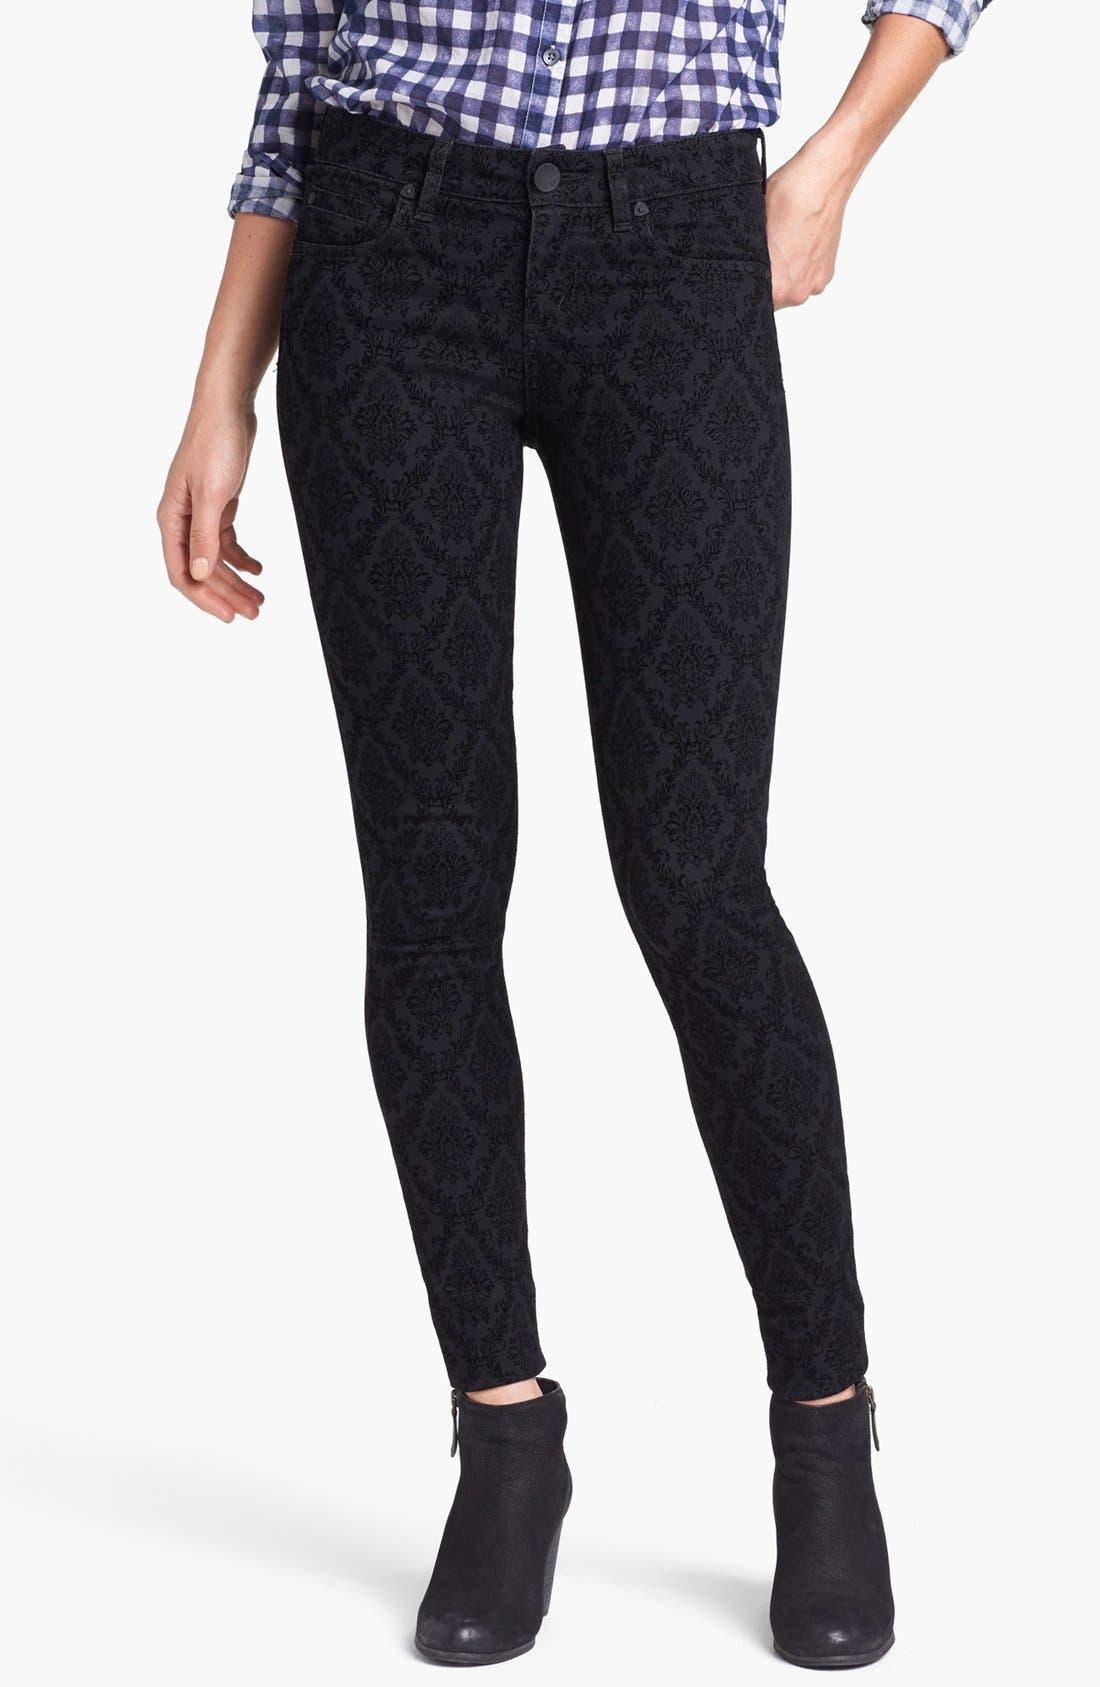 Main Image - KUT from the Kloth Print Skinny Jeans (Black Brocade Print)